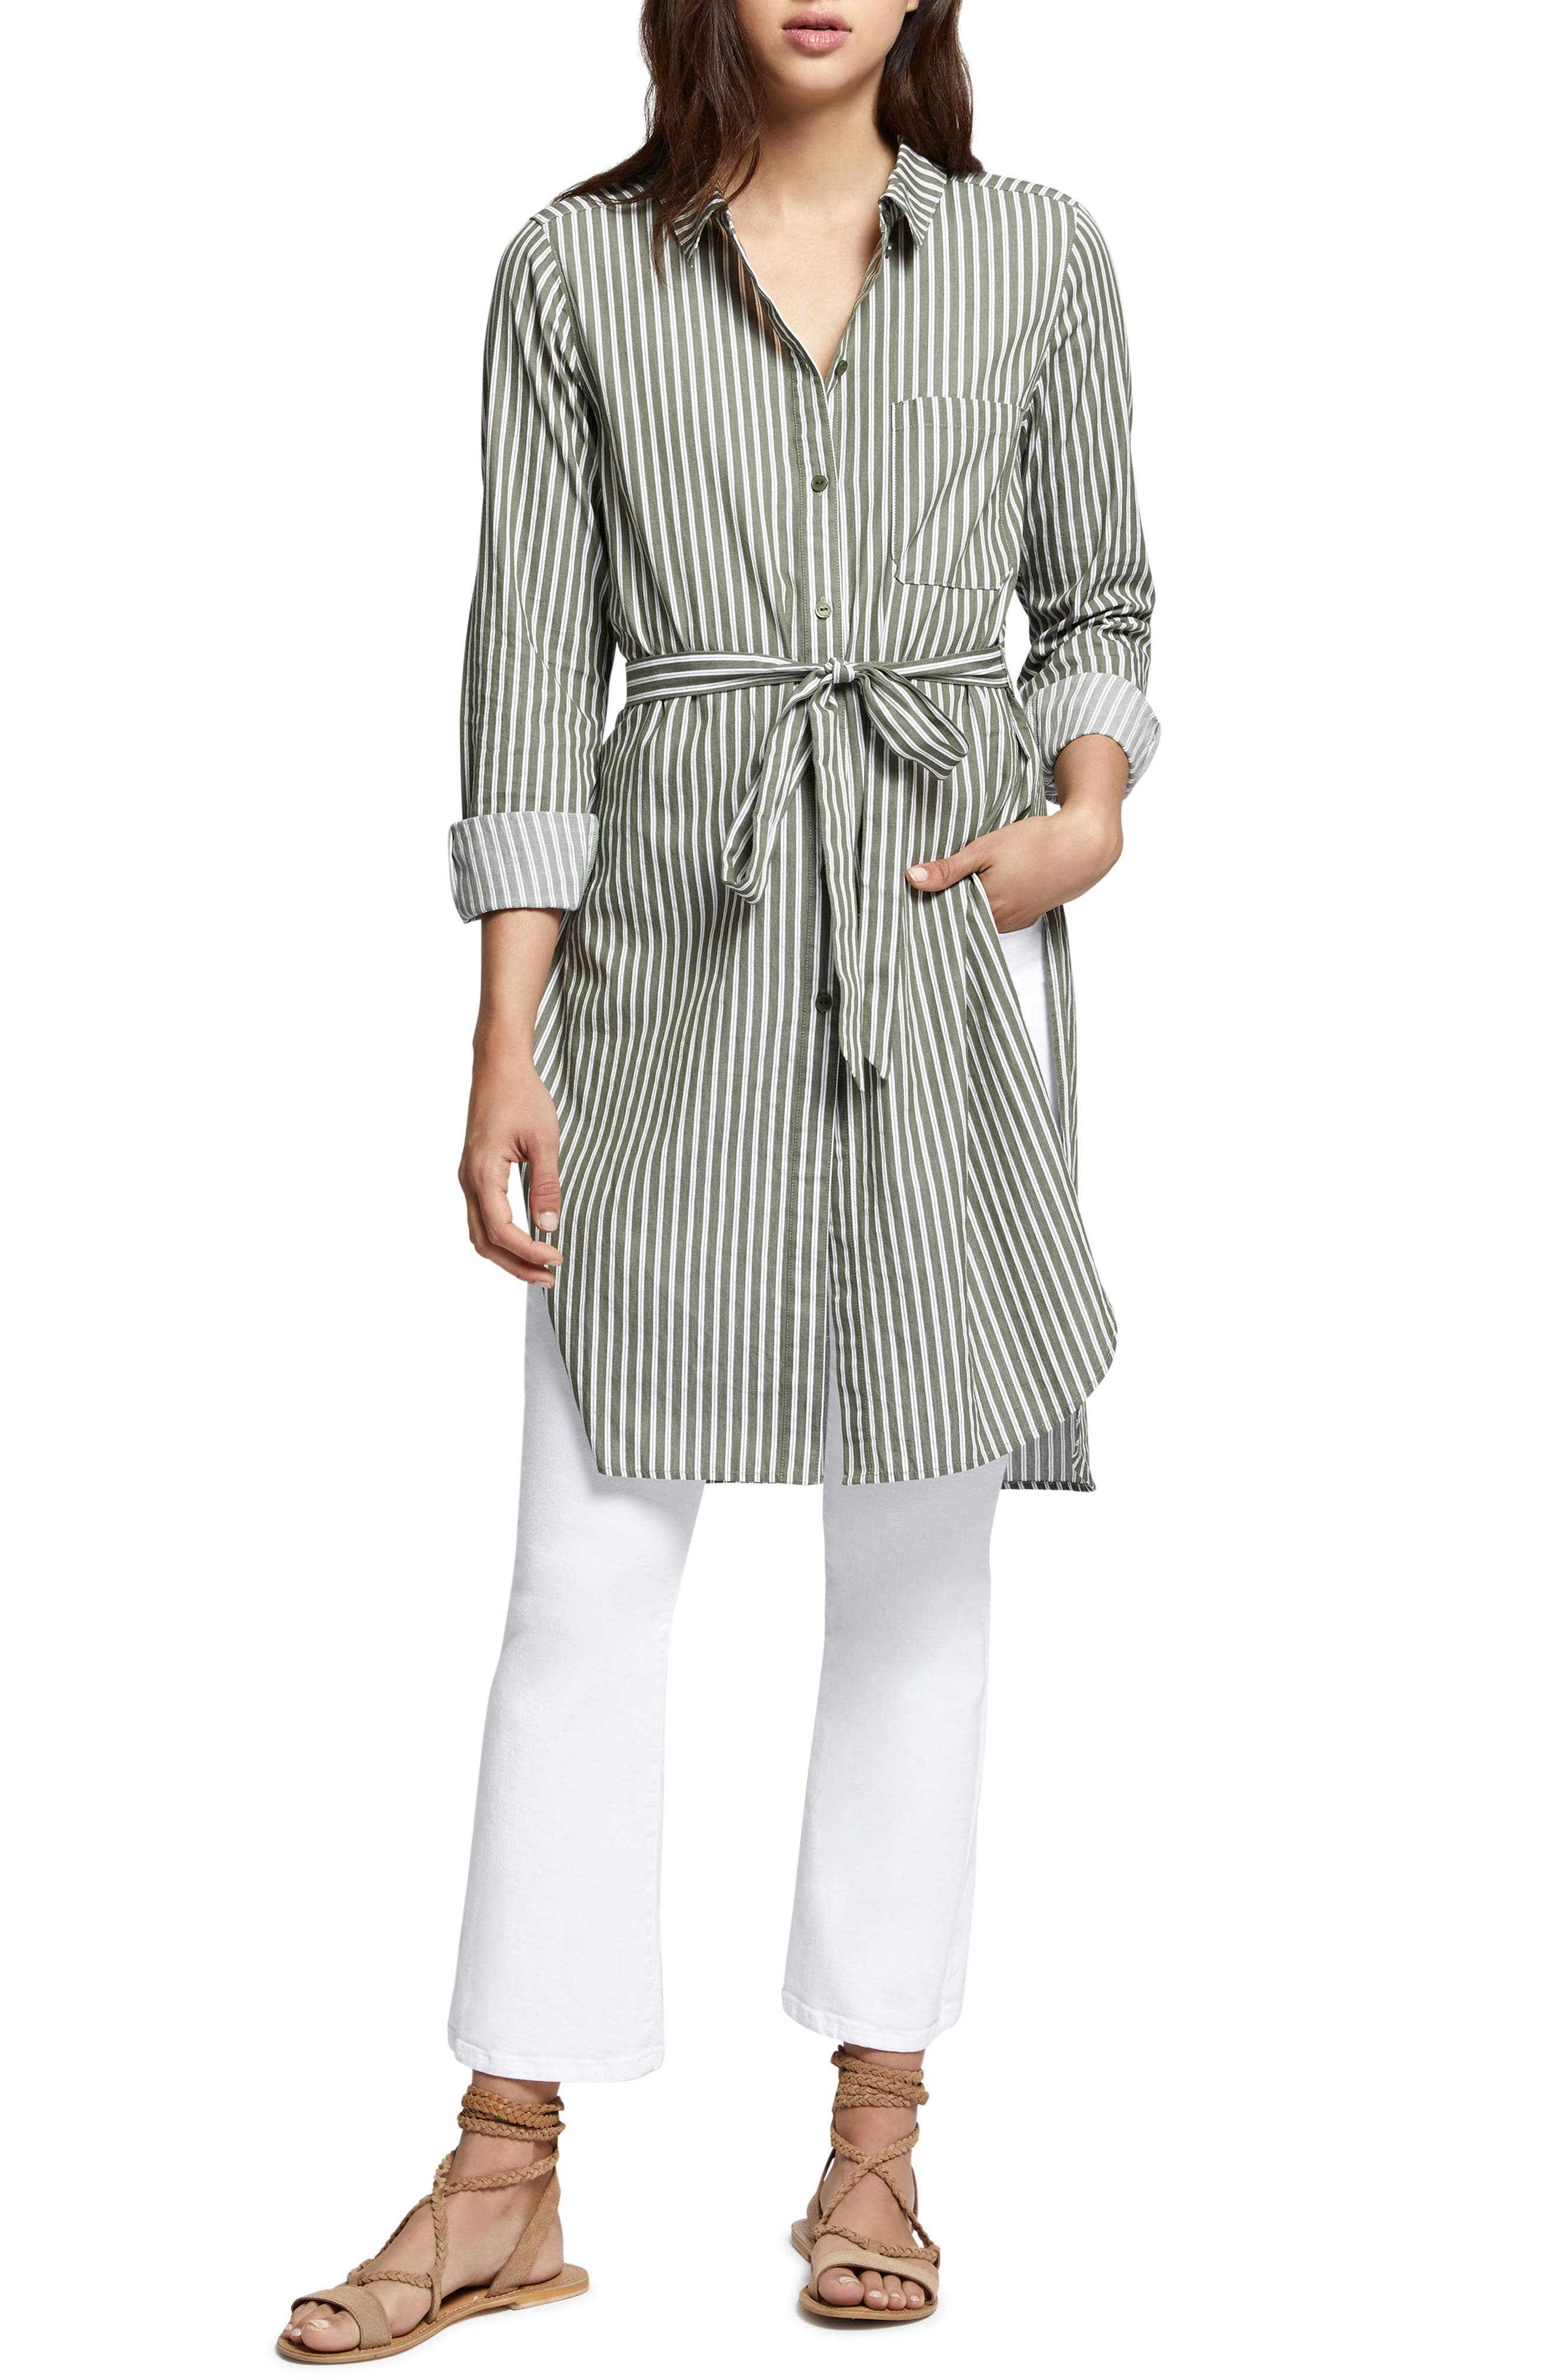 Teagan Maxi Shirt,                         Main,                         color, Cadet Stripe